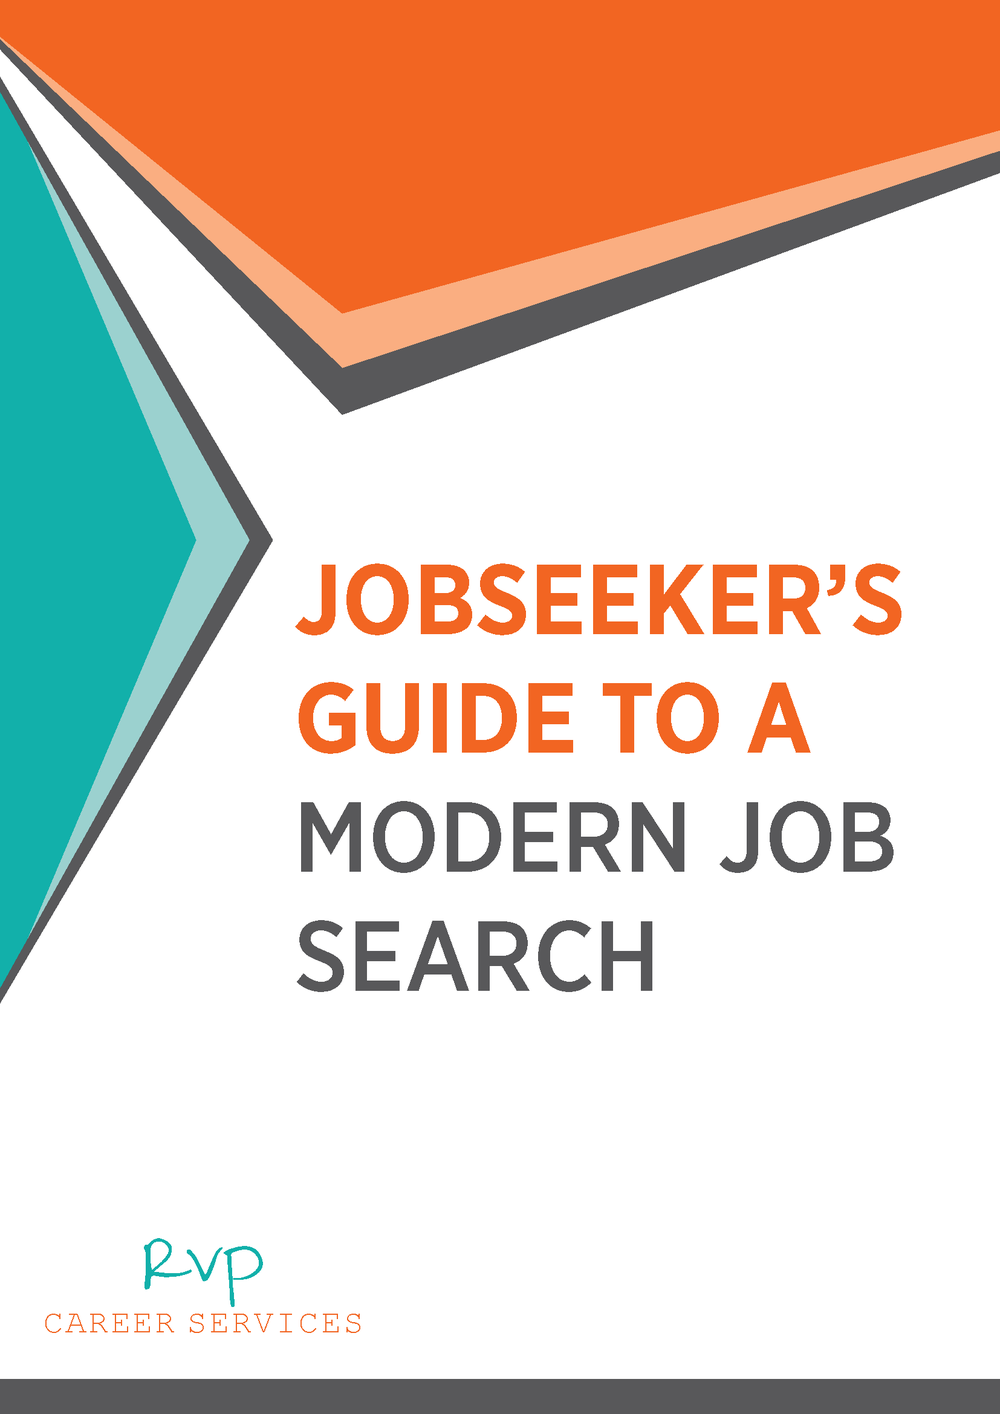 Jobseeker's Guide to a Modern Job Search